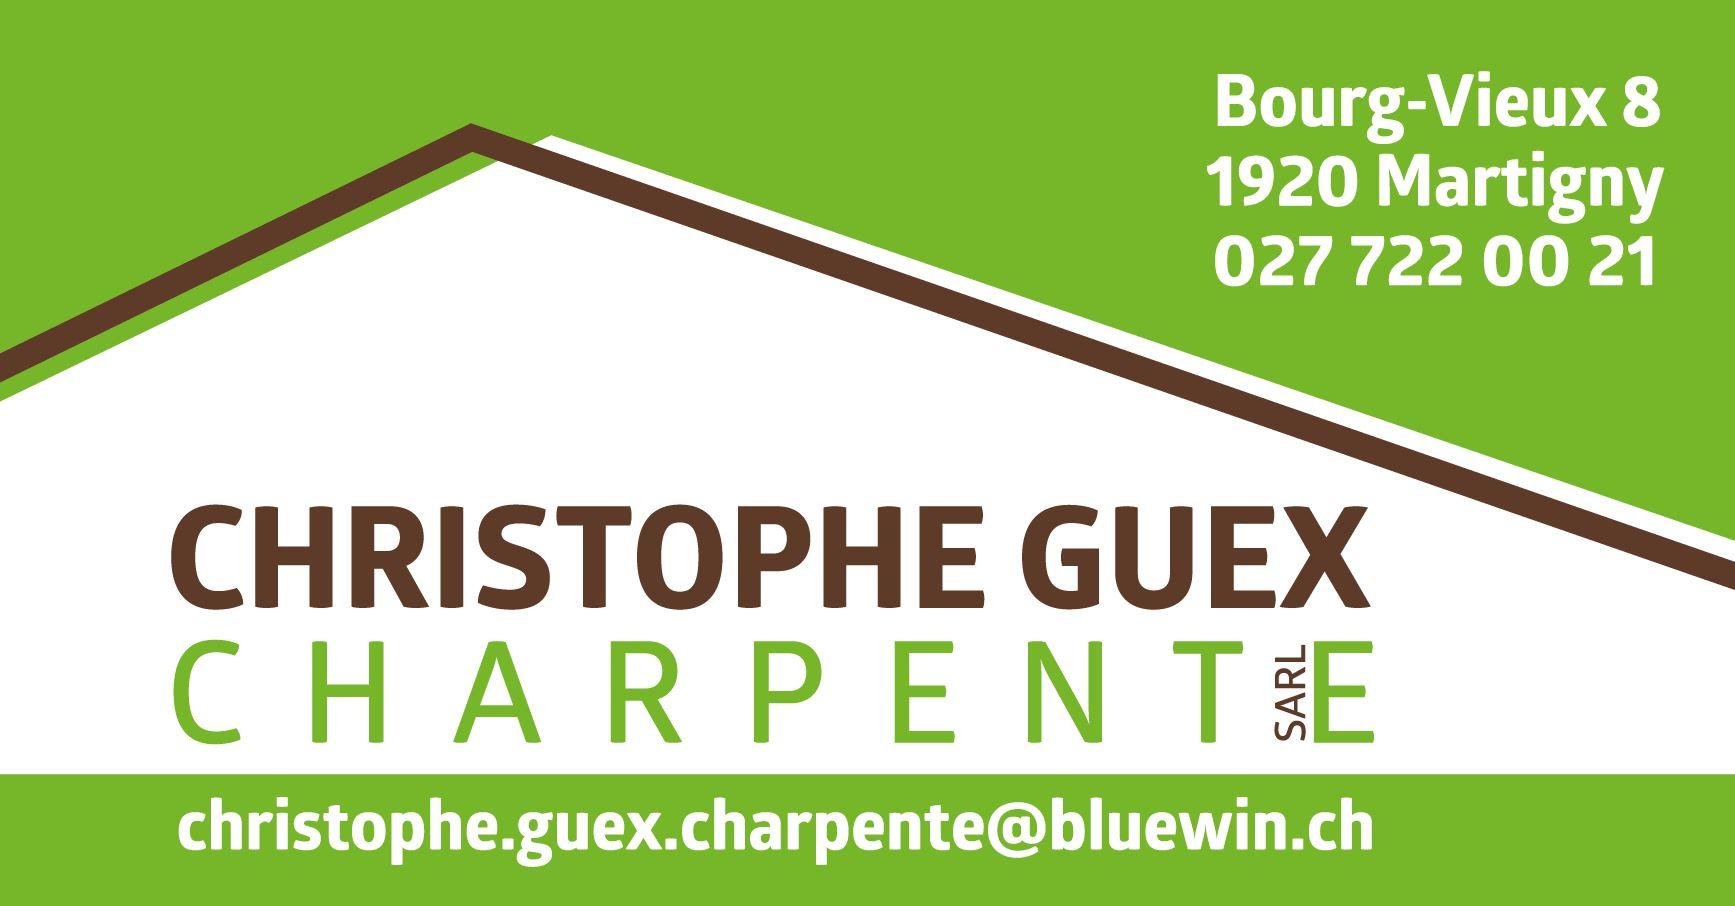 Christophe GUEX Charpente Sàrl